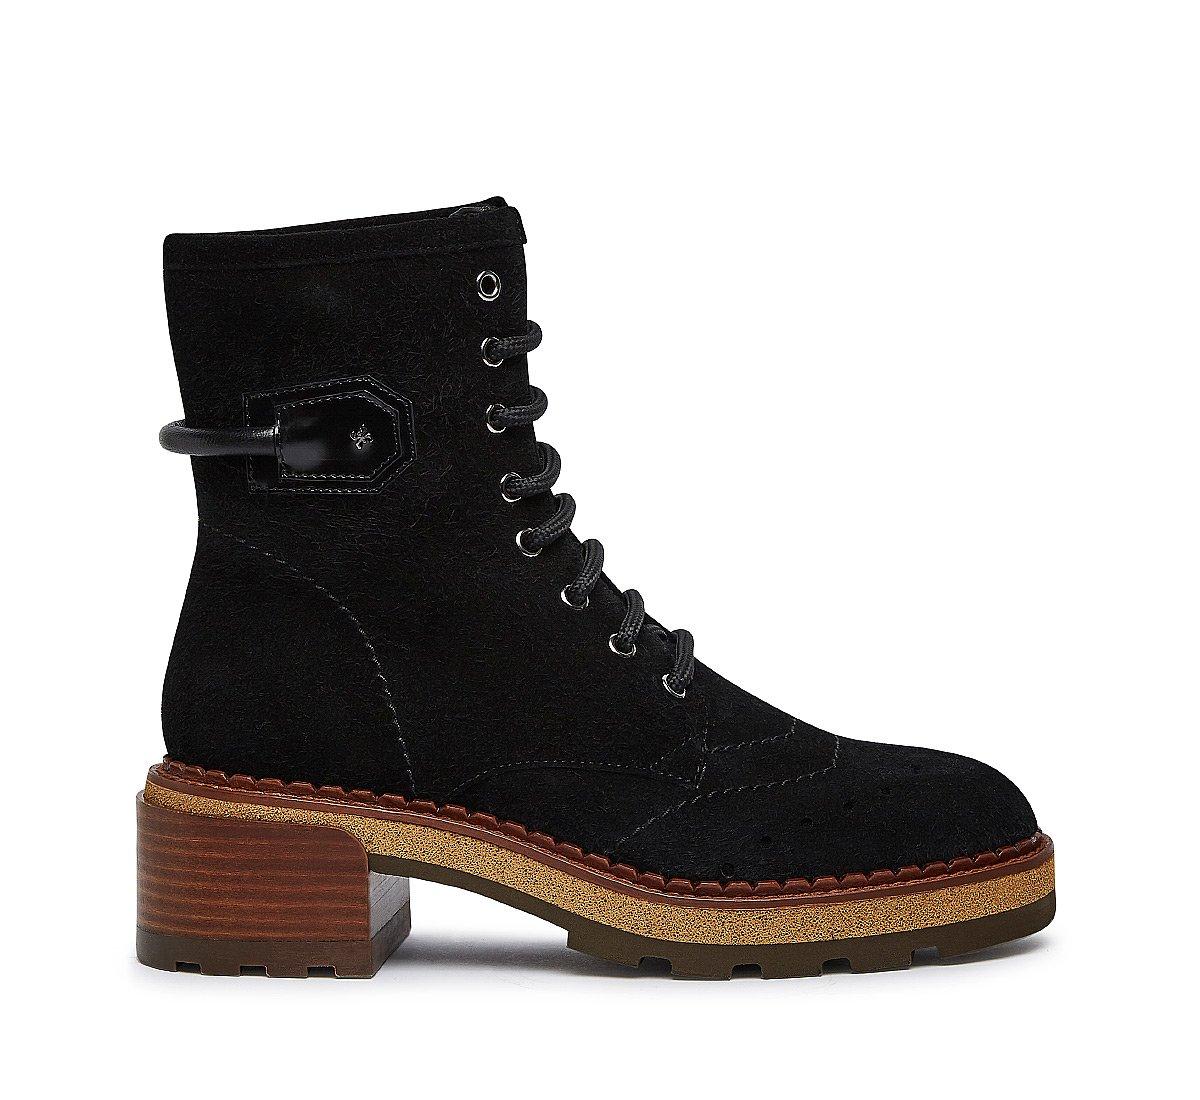 Exquisite suede boots